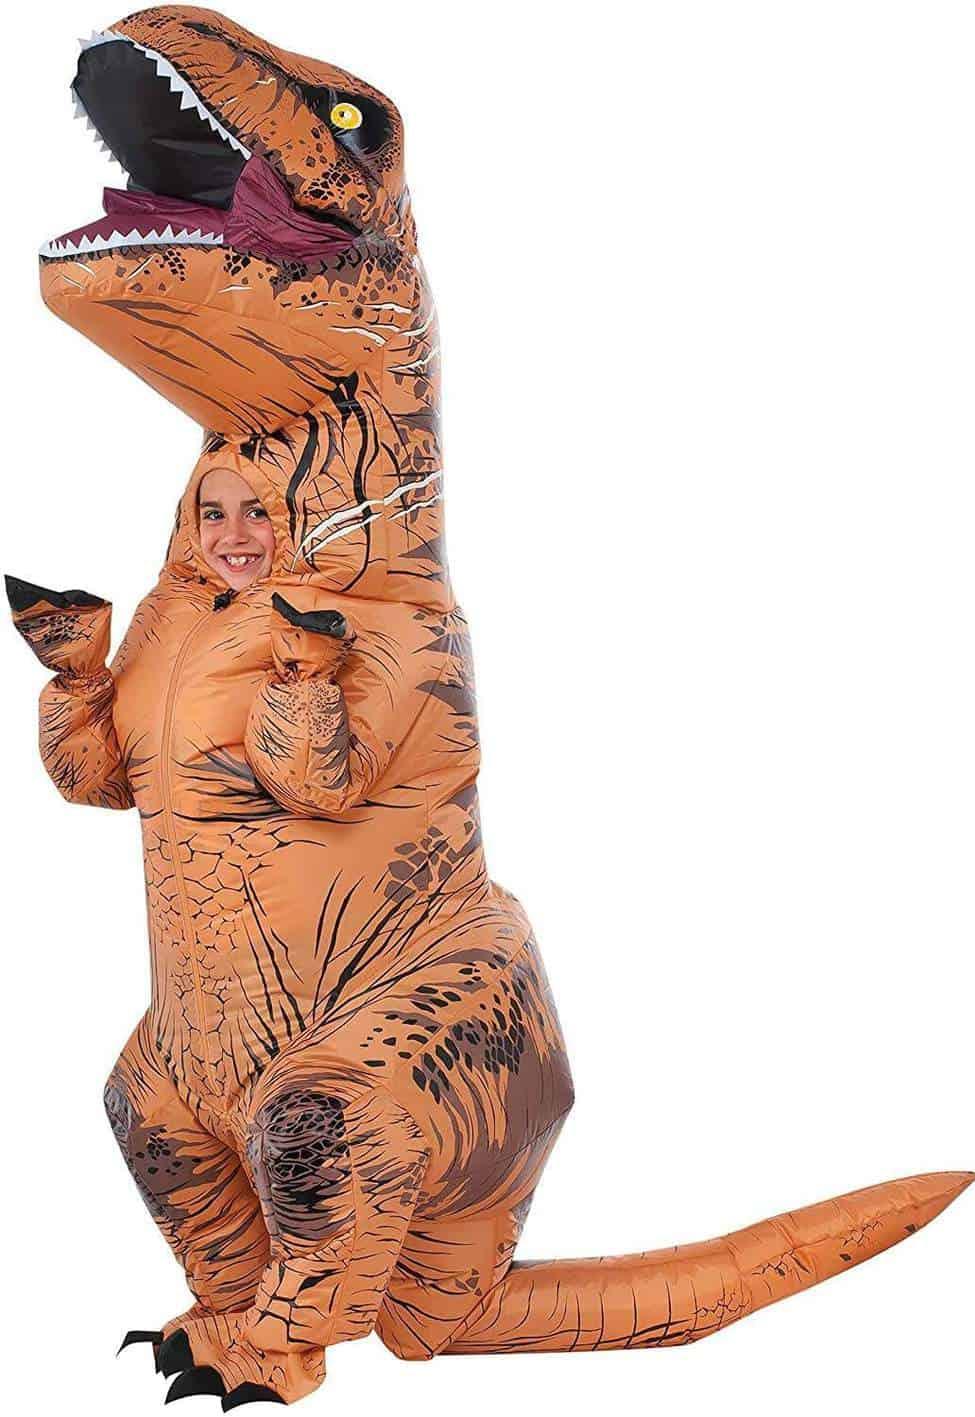 https://www.amazon.com/s?k=dinosaur+costume&_encoding=UTF8&camp=1789&creative=9325&linkCode=ur2&linkId=cc4afff19f7cb161a040a8196e34984c&tag=bikesreview0f-20&ref=nb_sb_noss